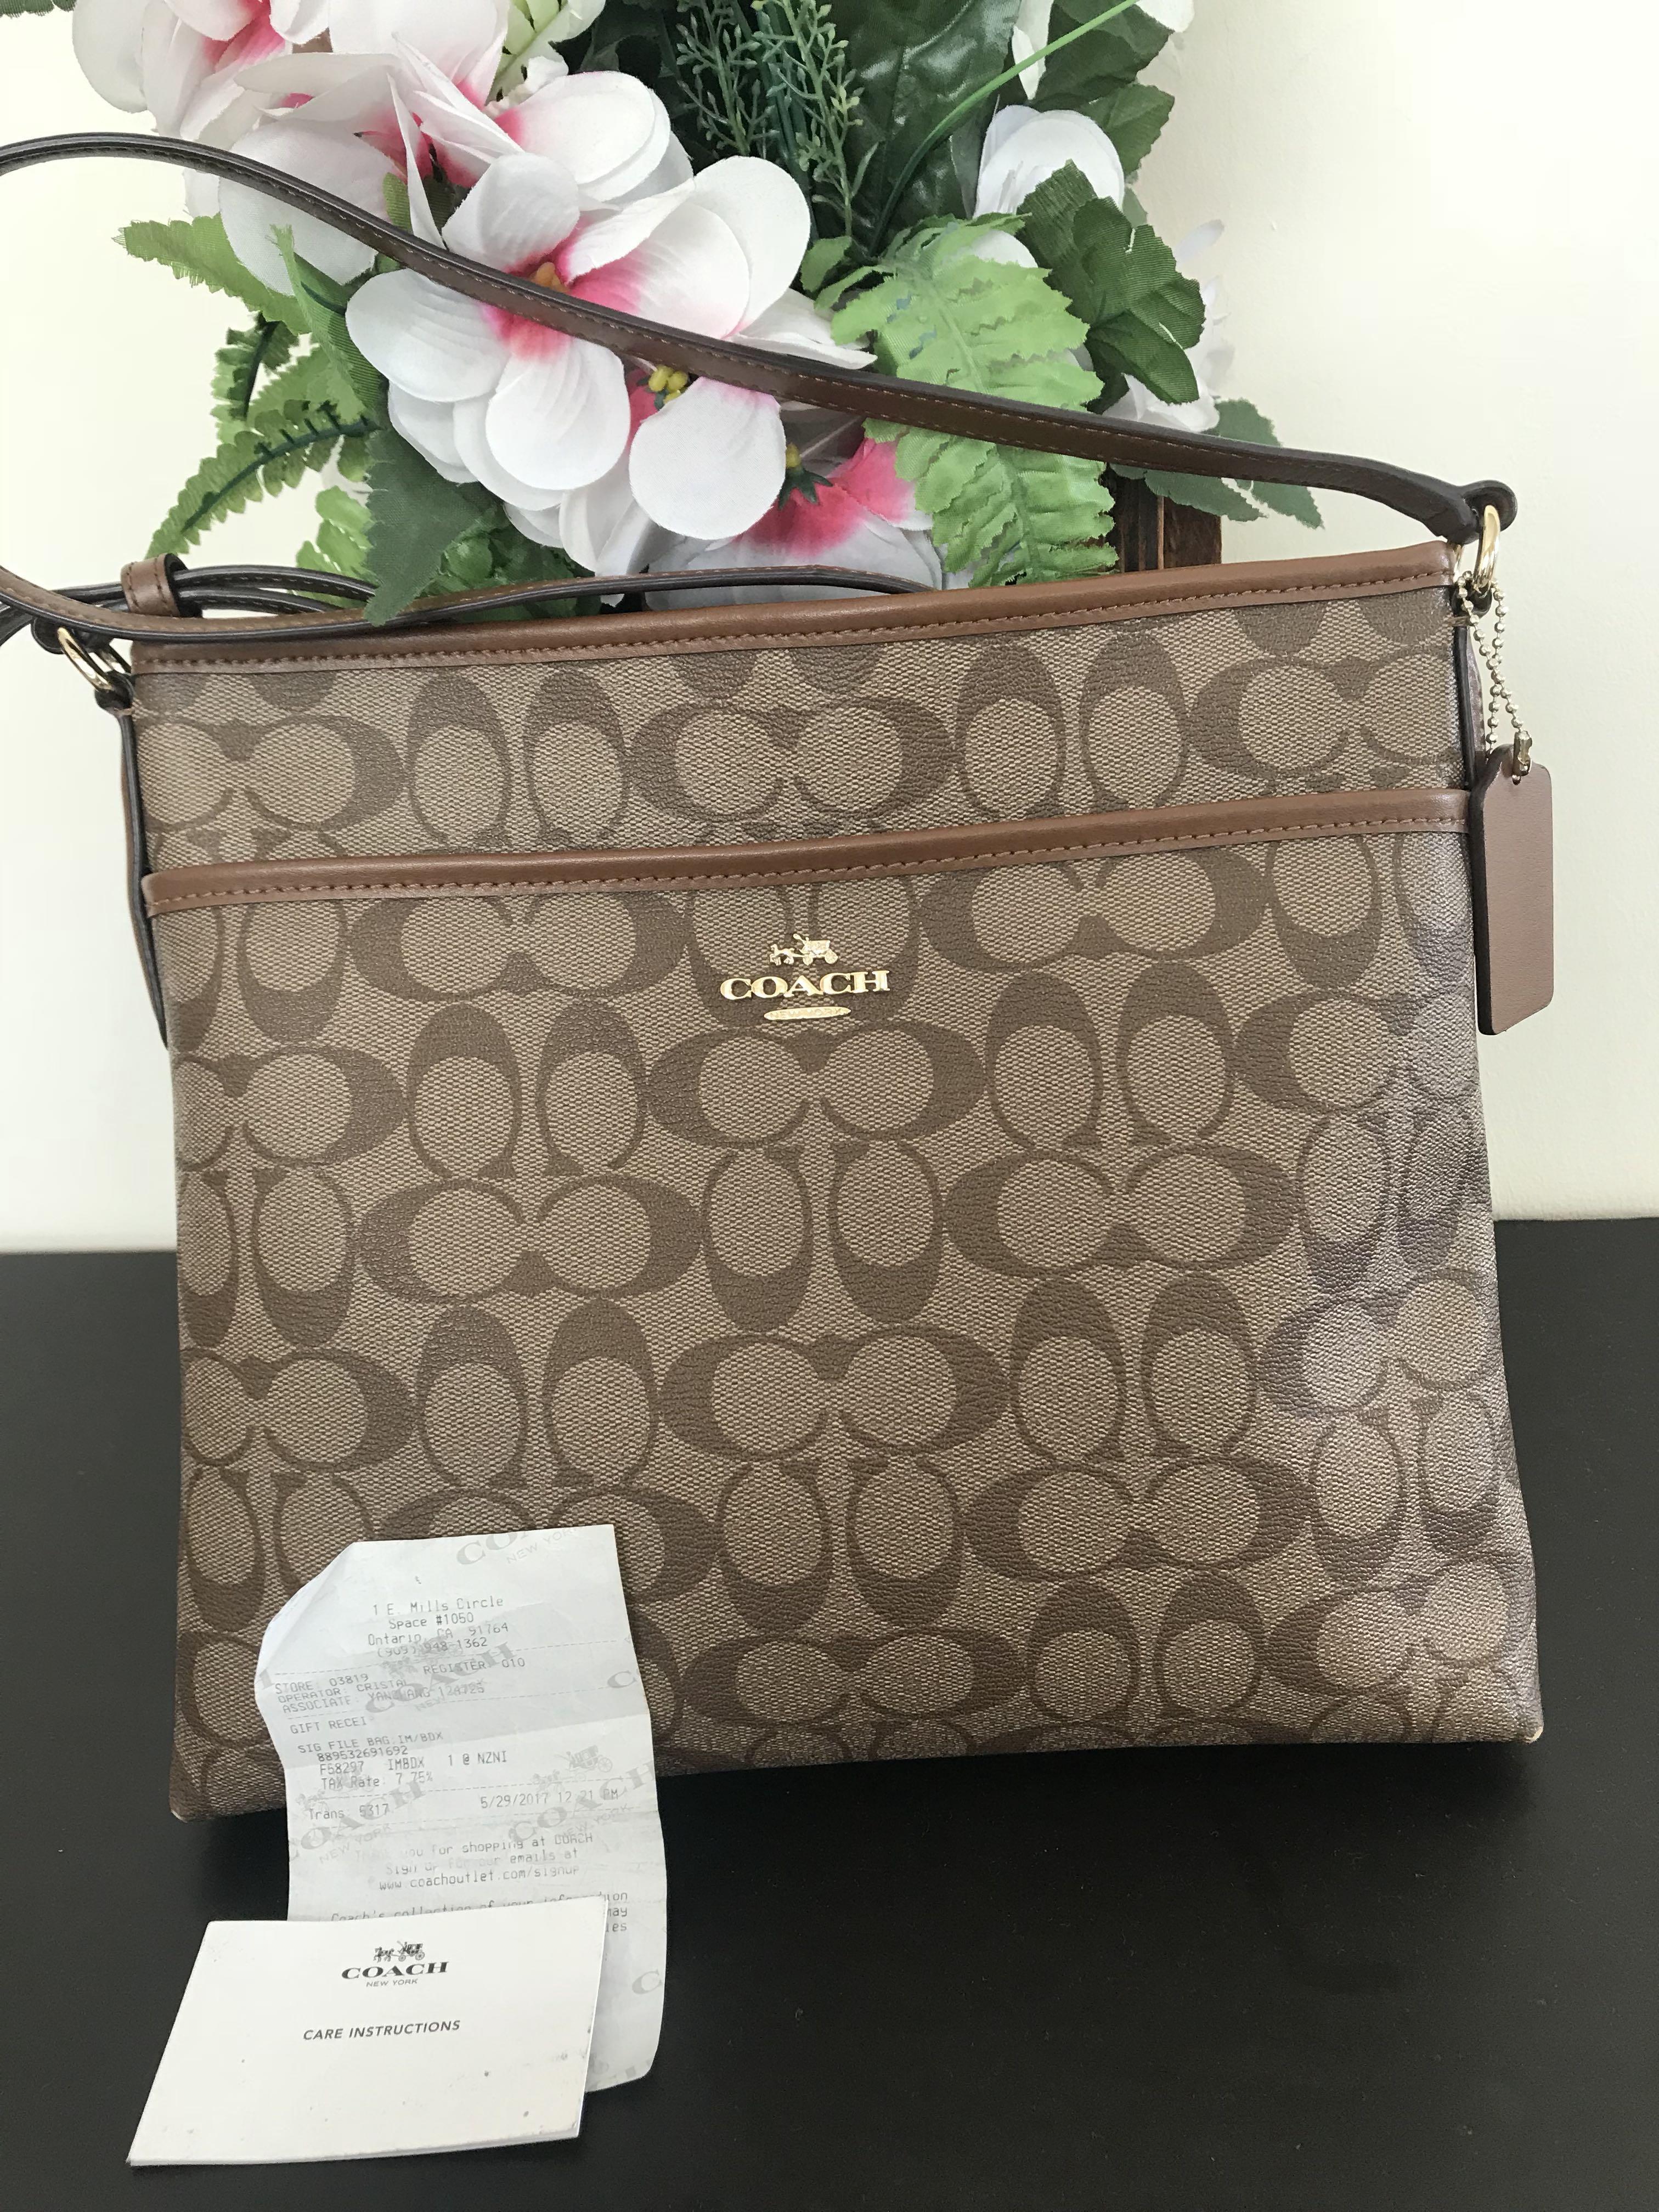 38e386abdb6f Coach Document Bag, Women's Fashion, Bags & Wallets, Handbags on ...